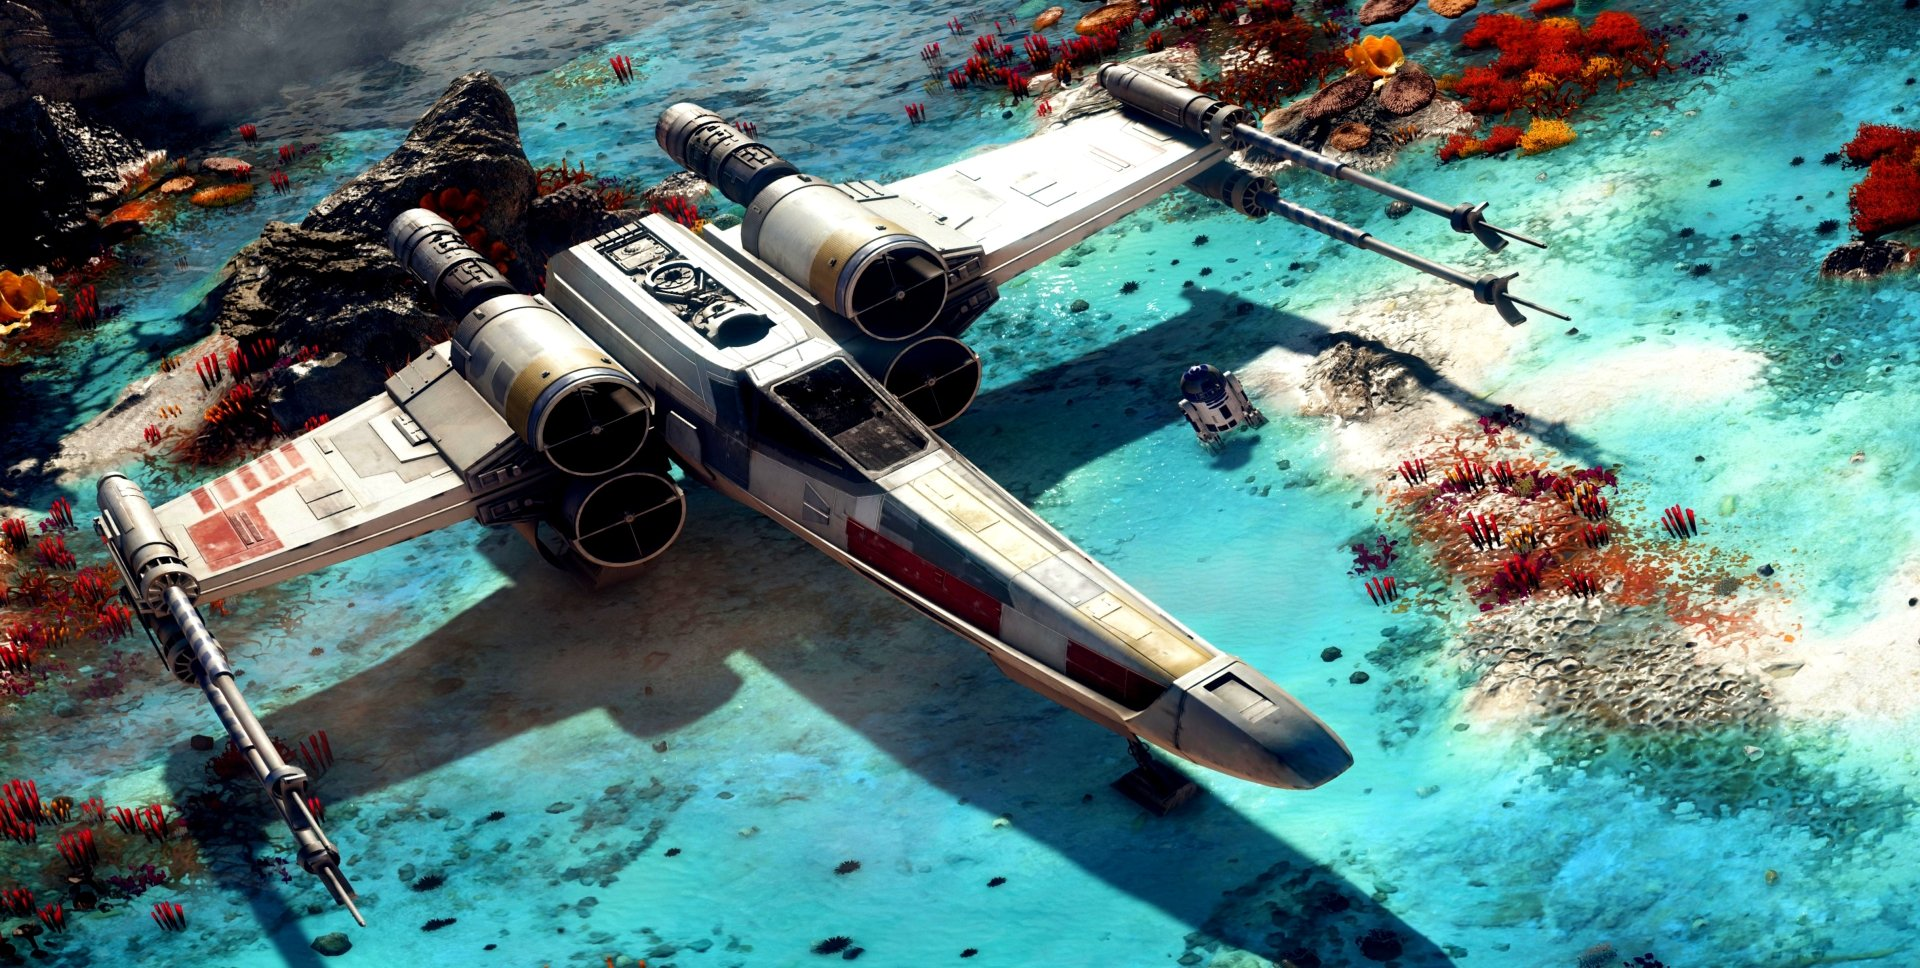 Star Wars Battlefront II (2017) 4k Ultra Fond d'écran HD ...